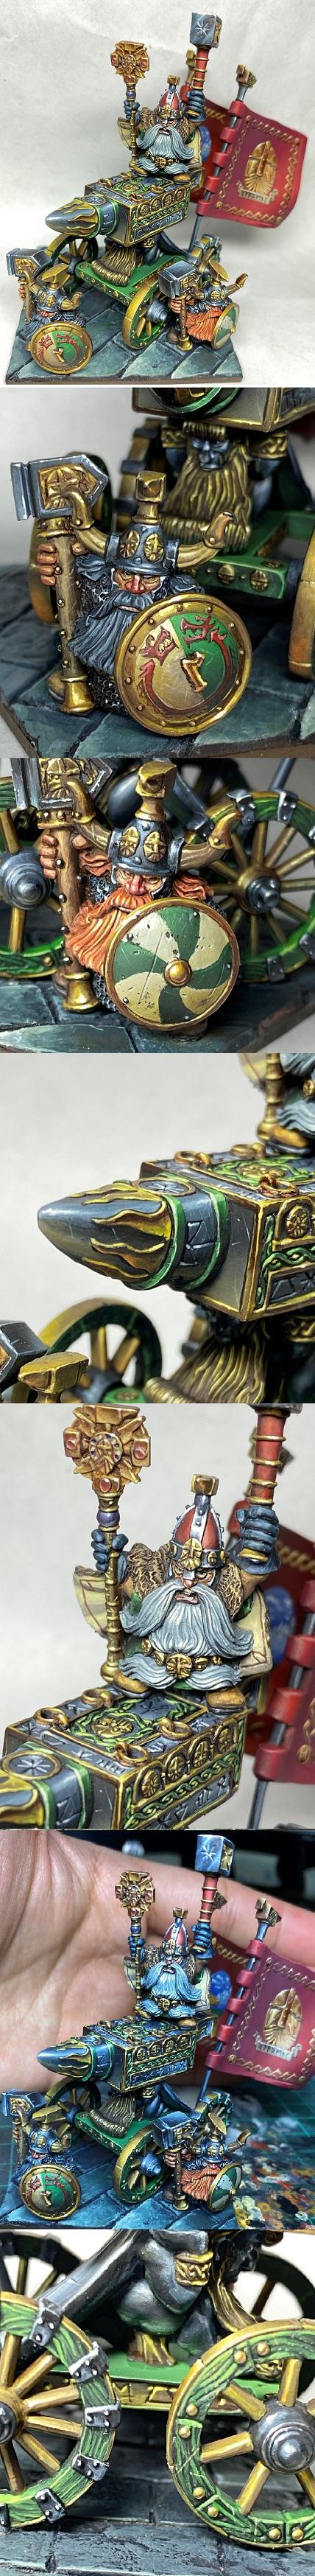 Warhammer Fantasy Dwarf Anvil of Doom